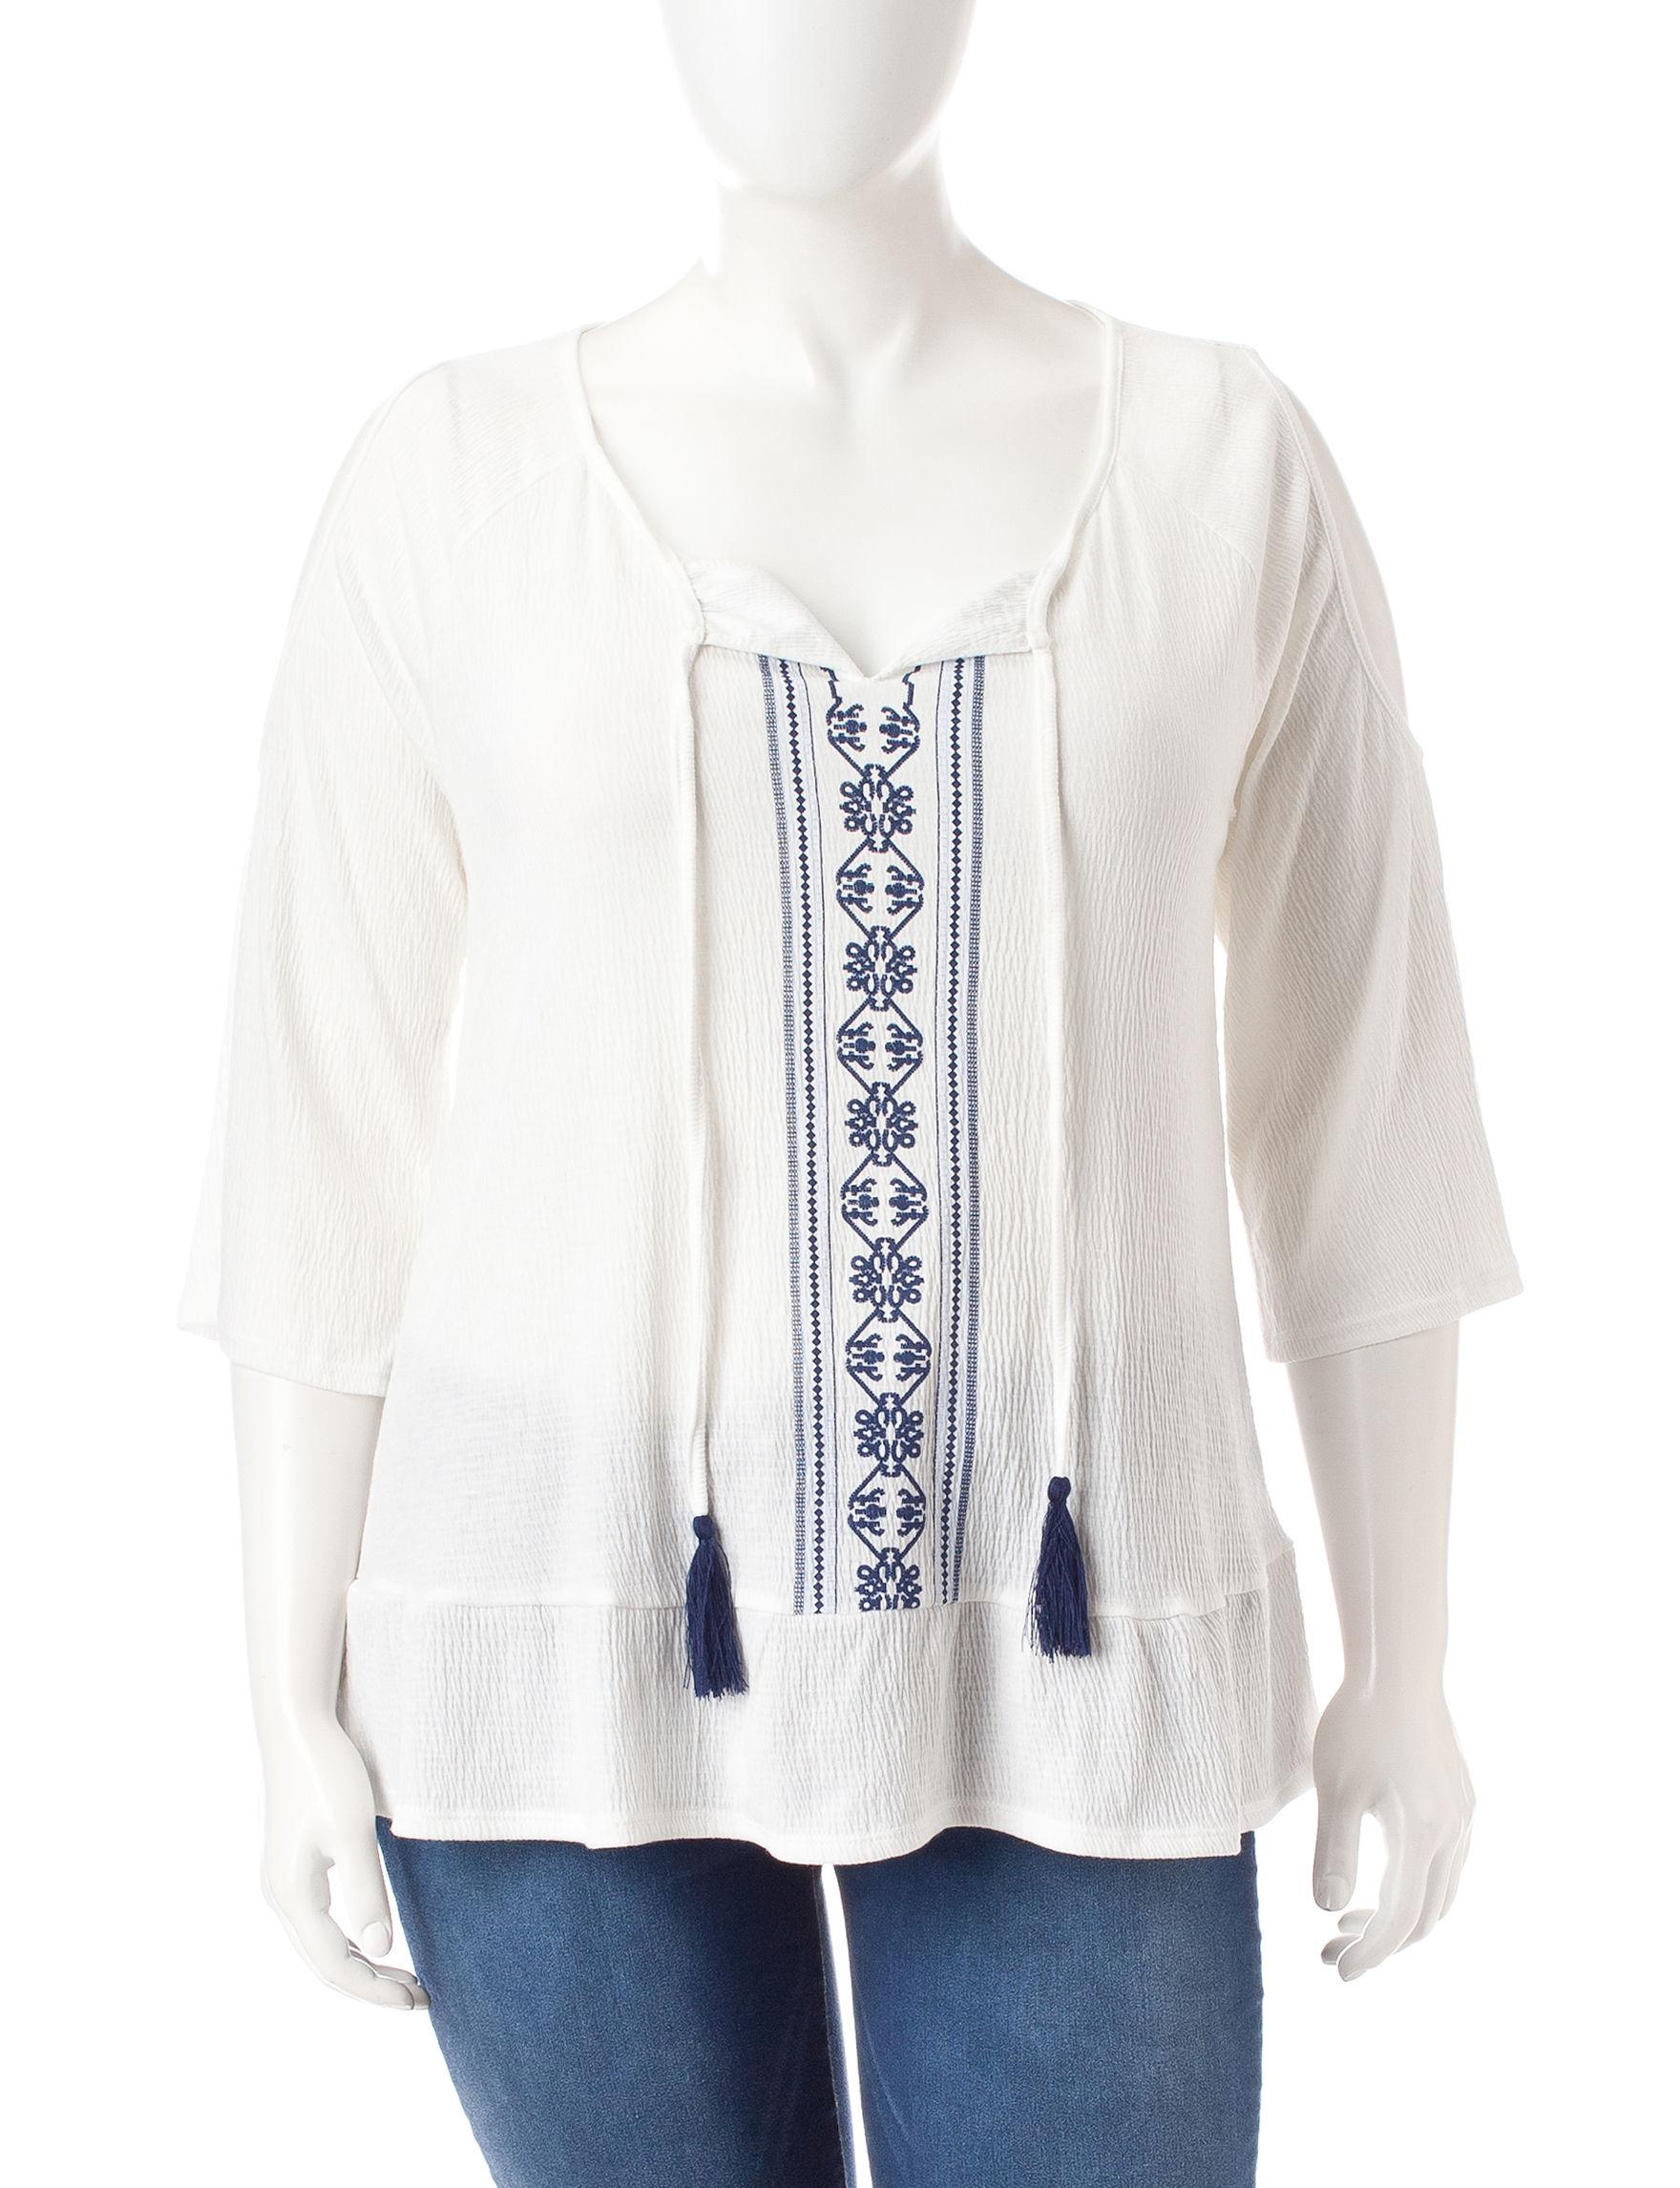 Signature Studio White / Navy Shirts & Blouses